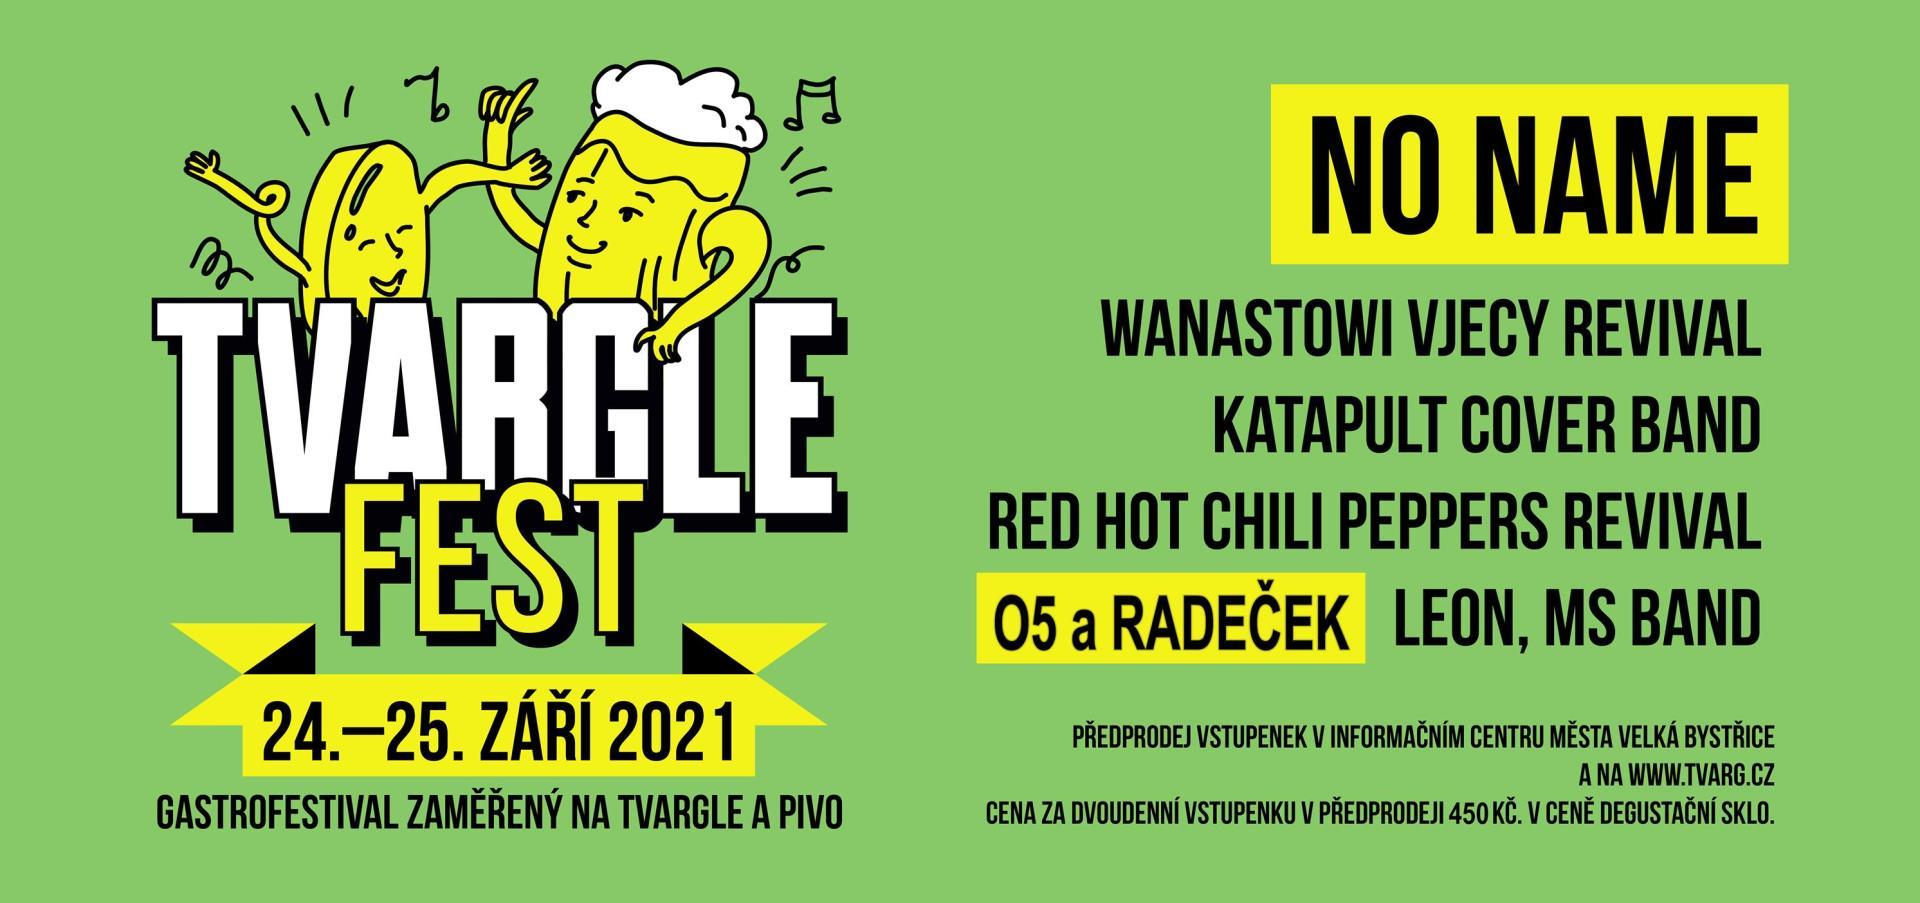 TVARGLE FEST 2021